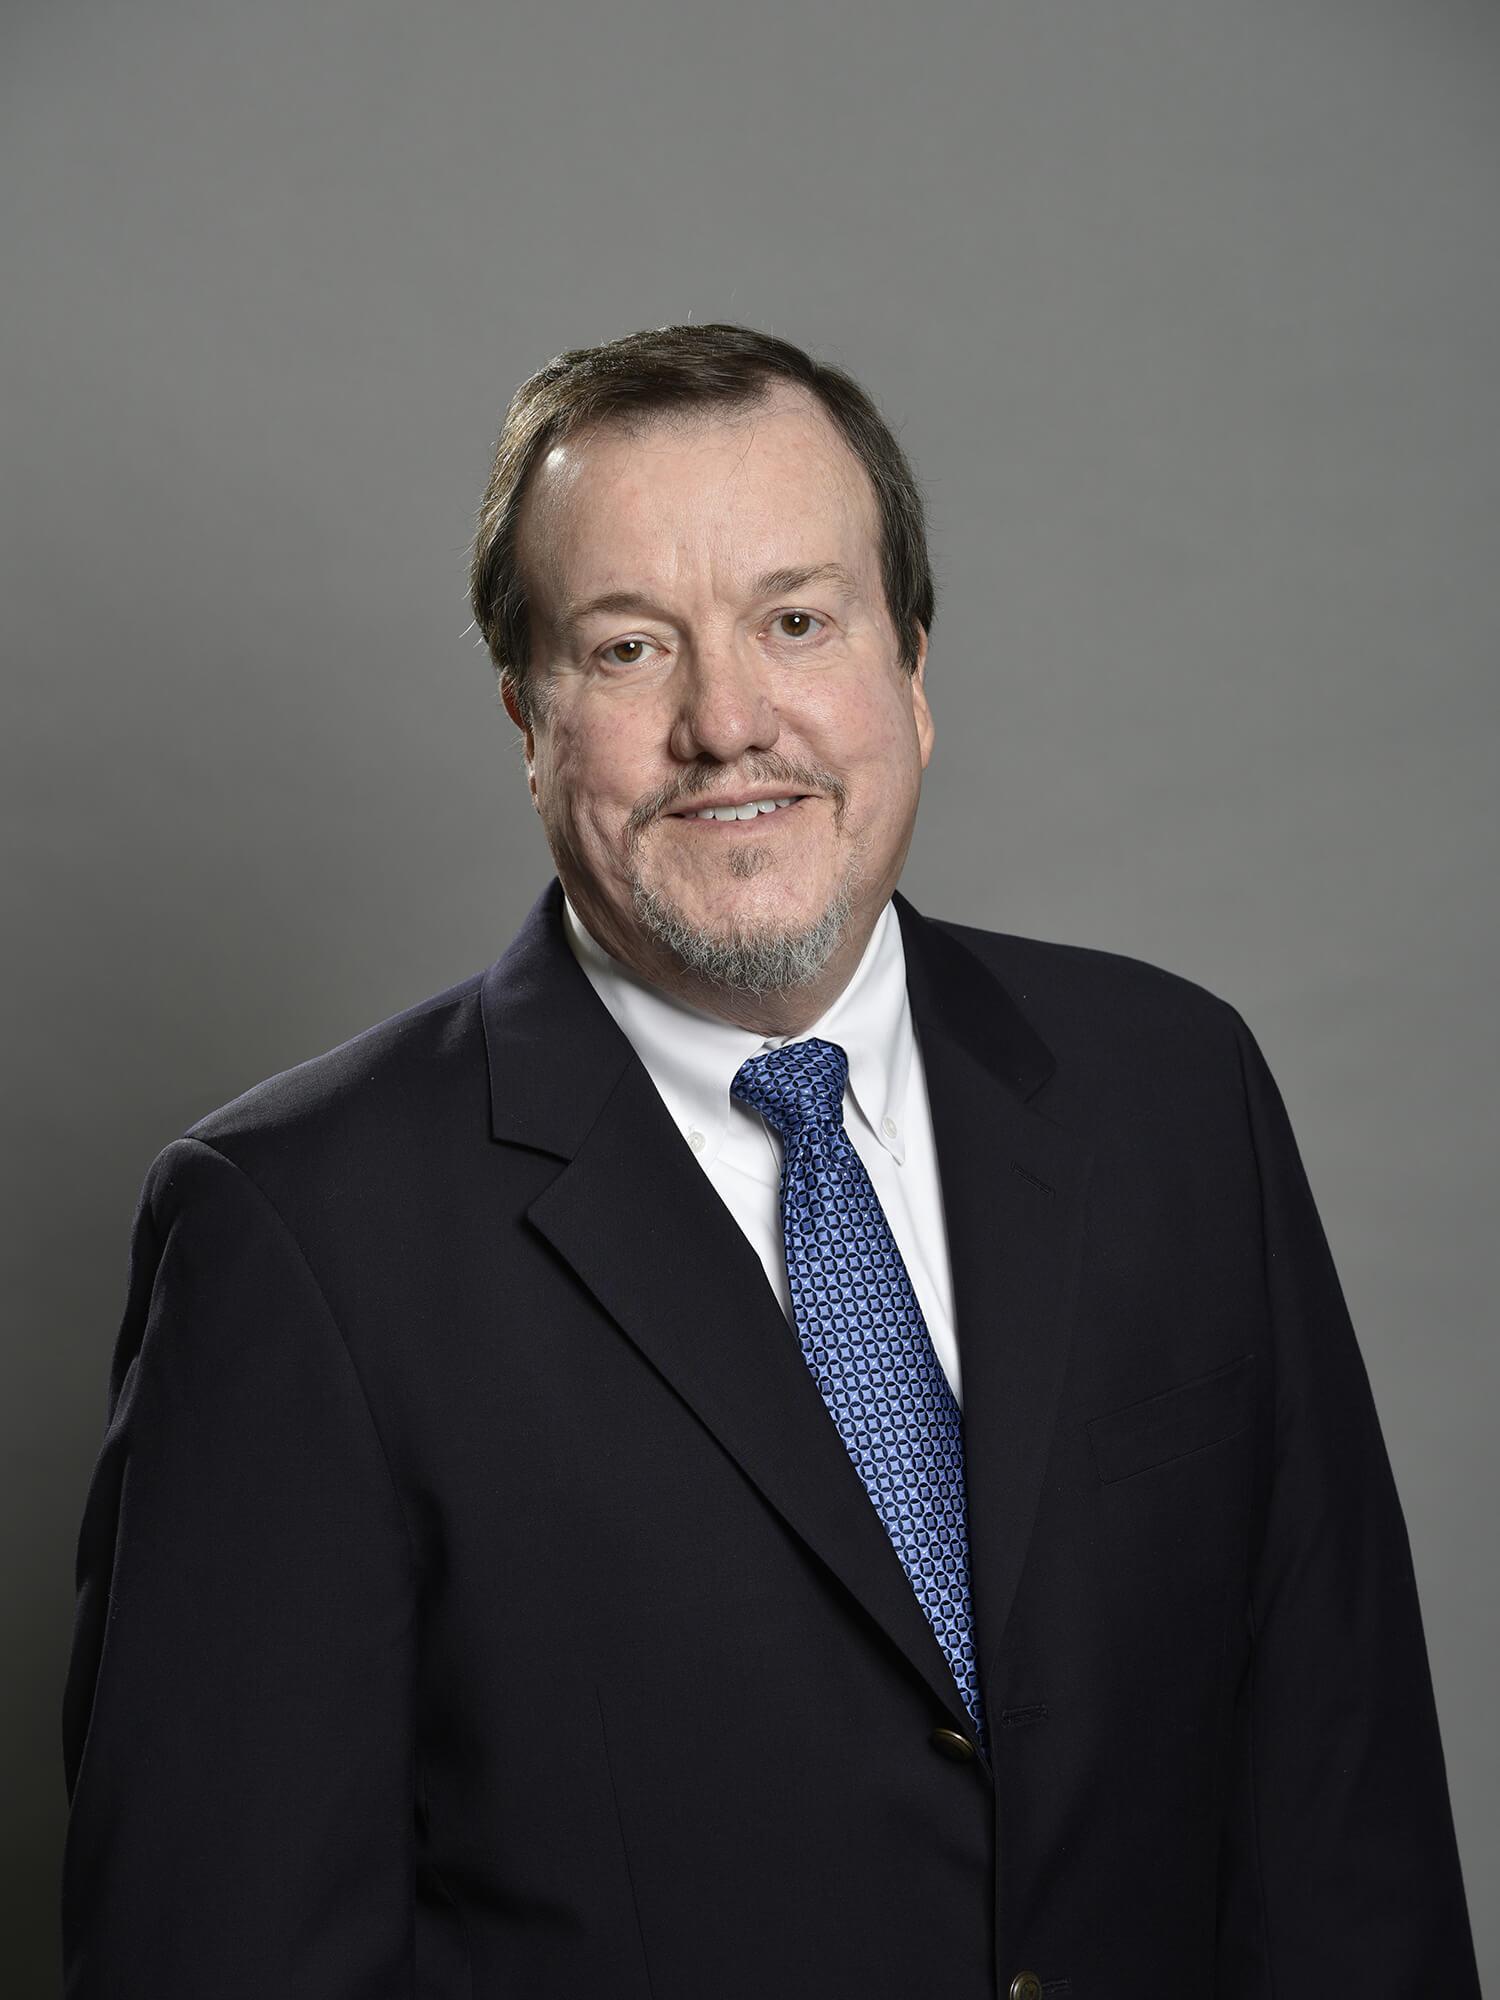 J. Michael Carmena